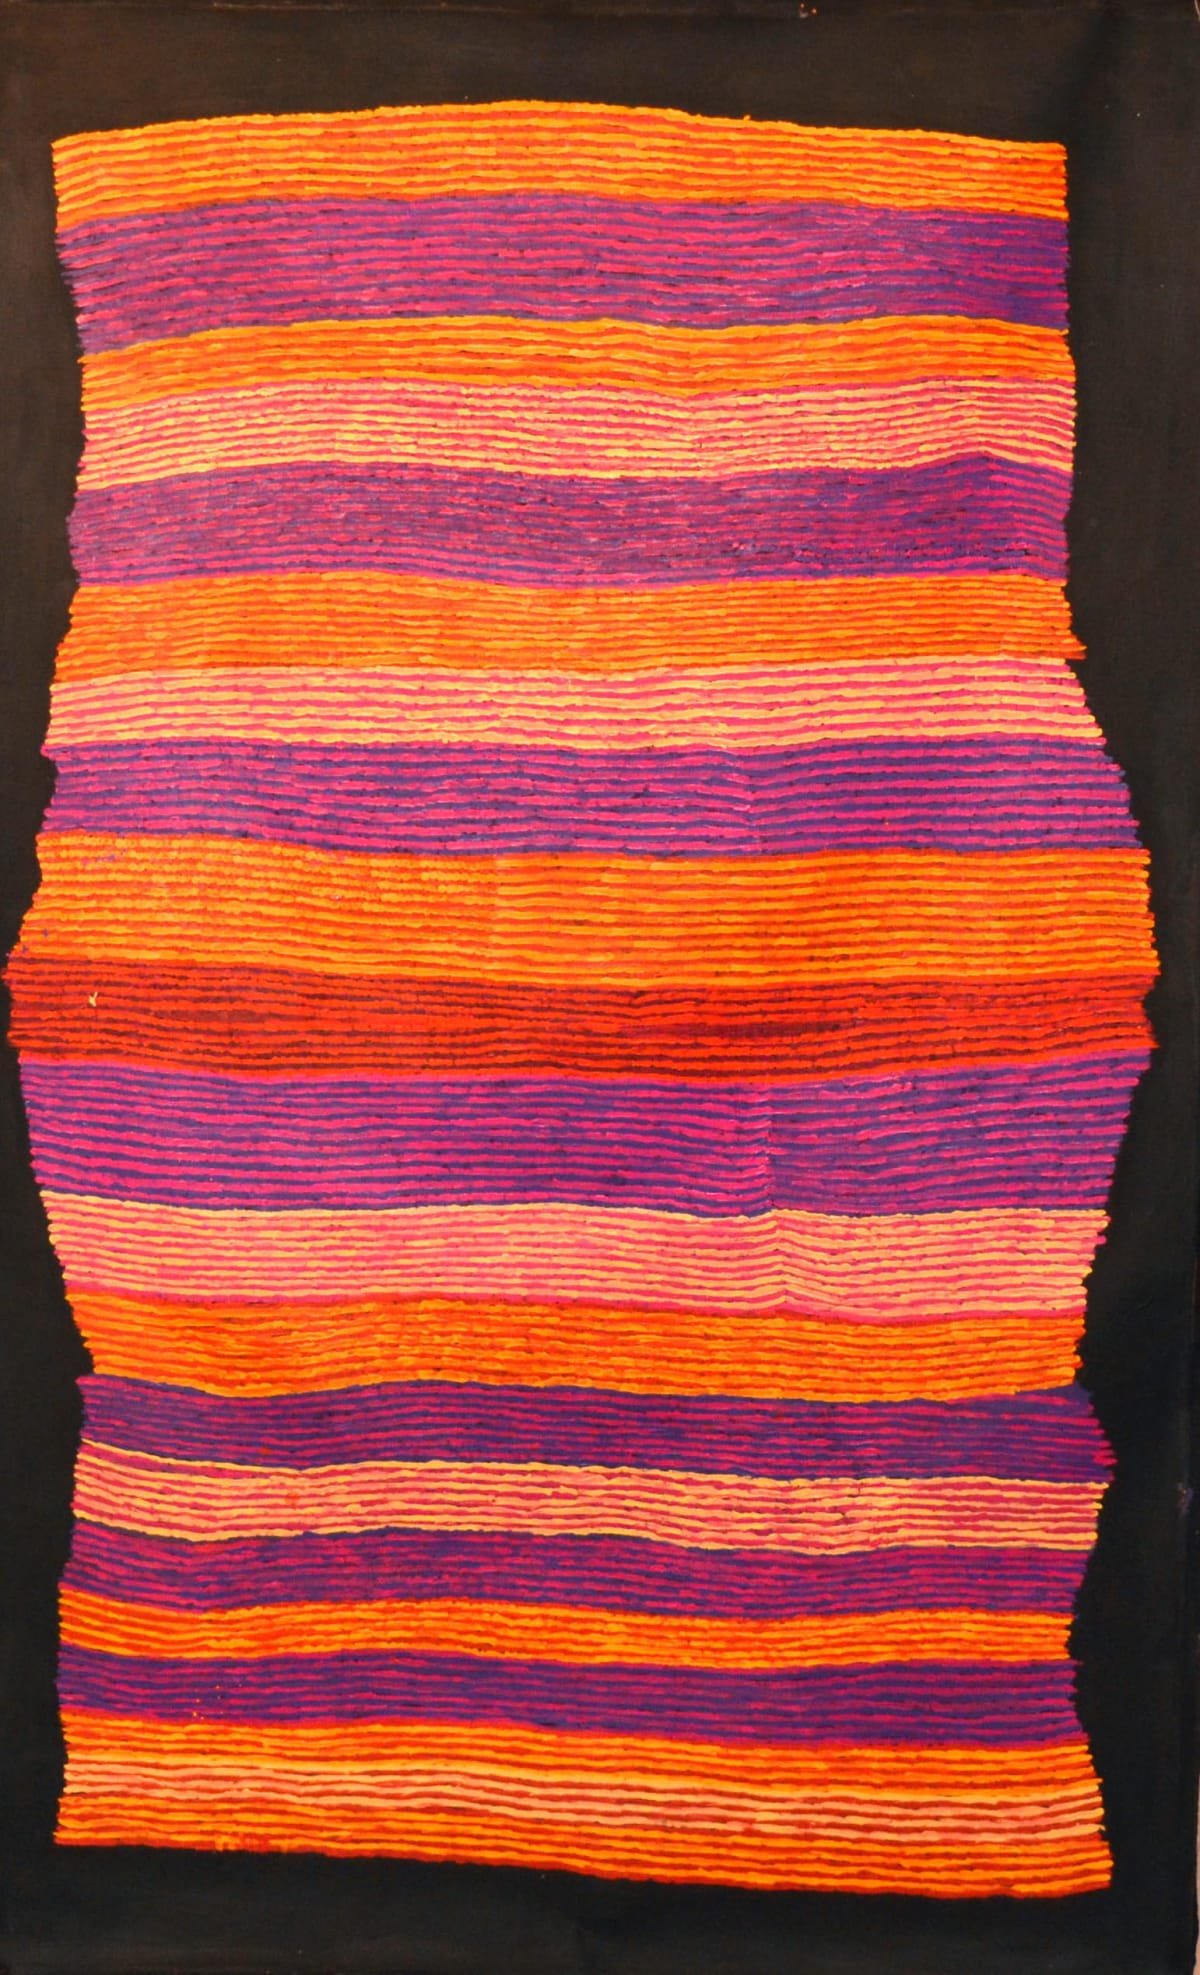 Ray Ken Tali - Sand Dune acrylic on linen 122 x 198 cm